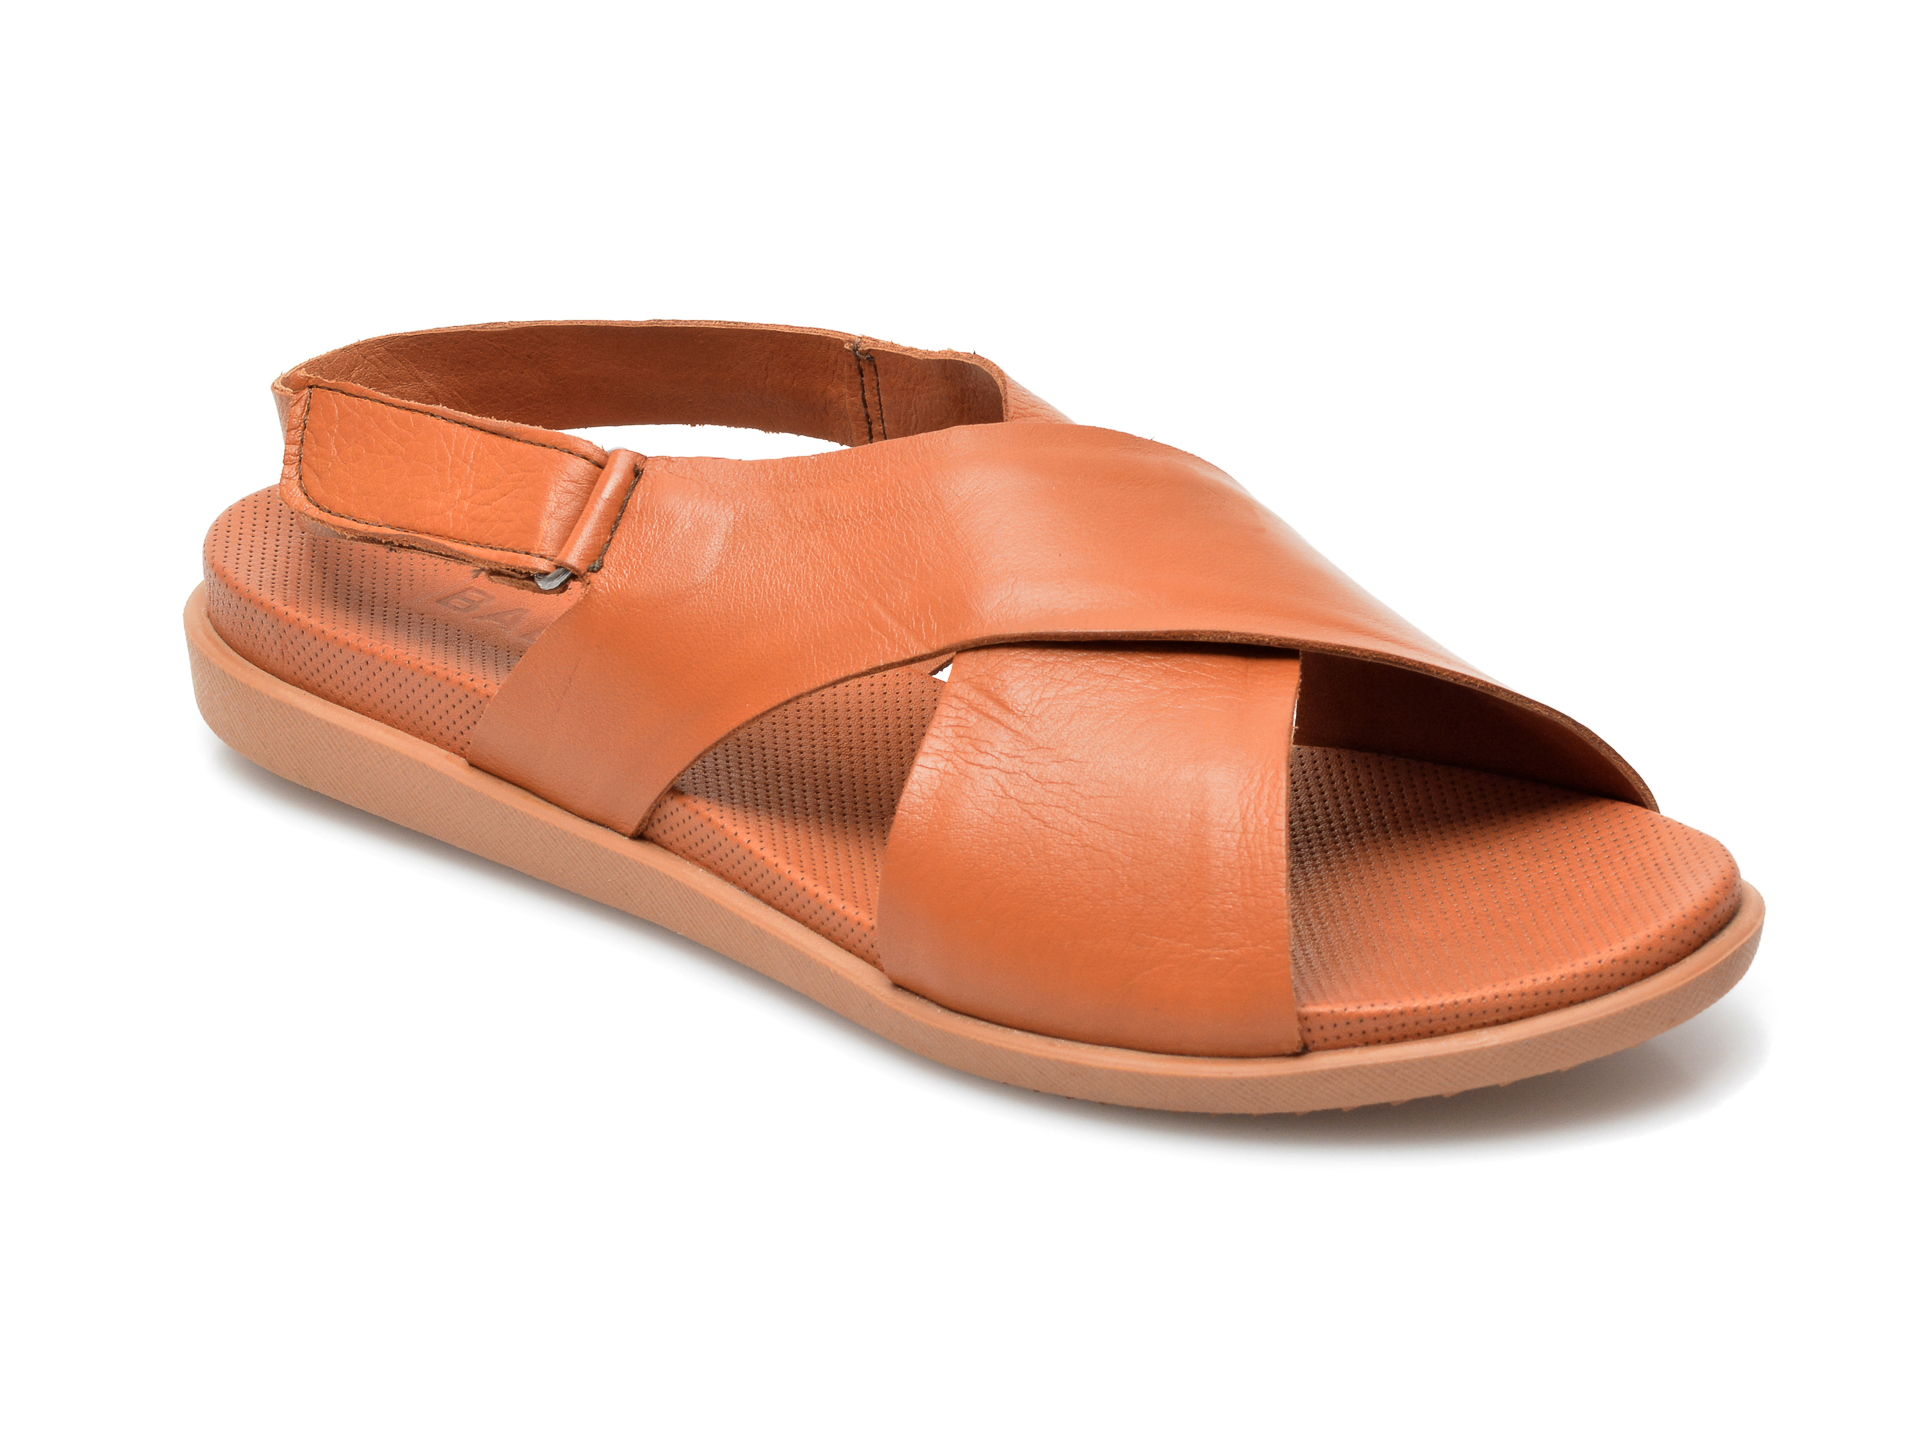 Sandale BABOOS maro, 1401, din piele naturala